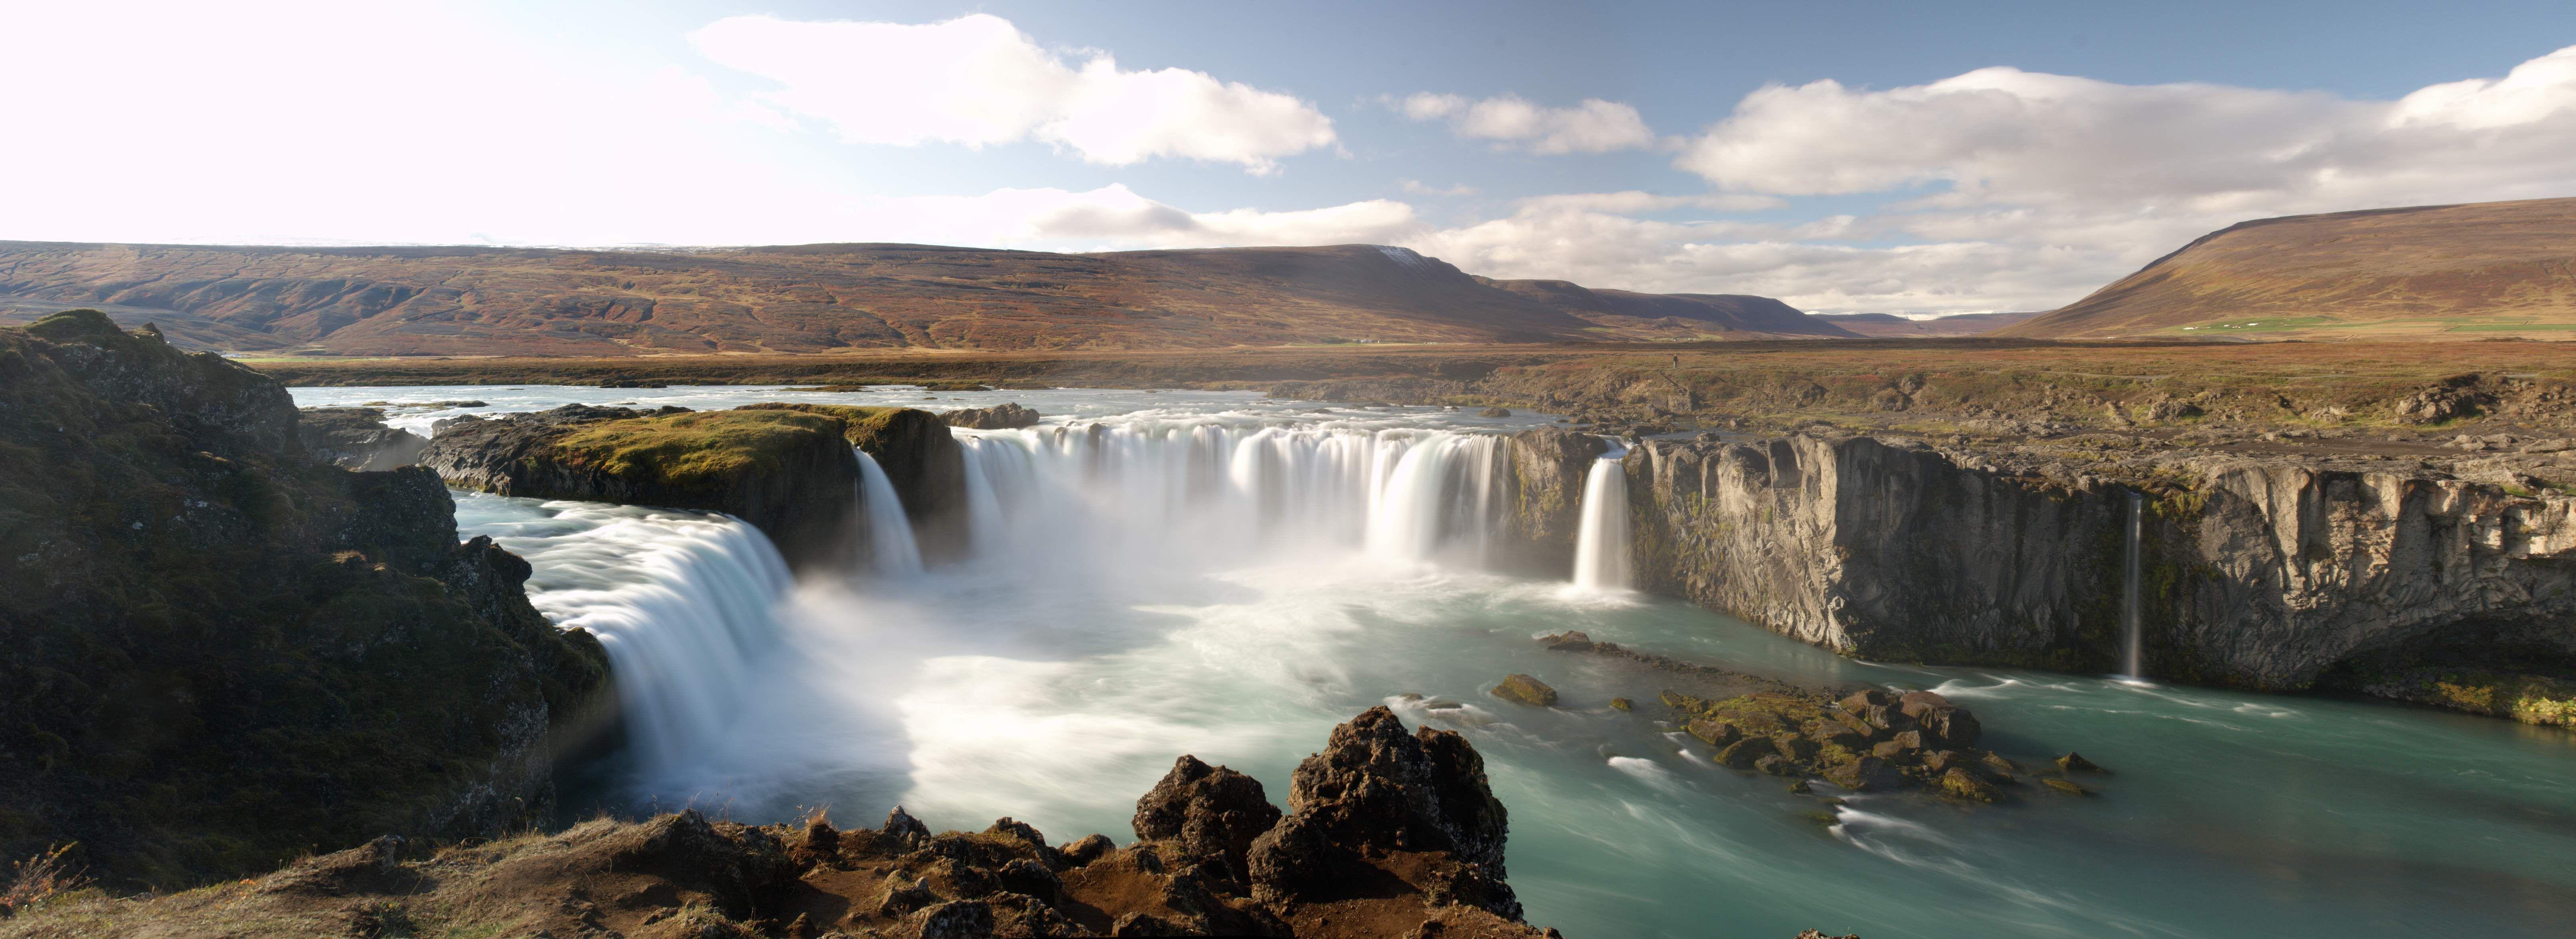 Panoramic Wallpaper Fall Iceland Waterfall Godafoss Panorama 4k Ultra Hd Fond D